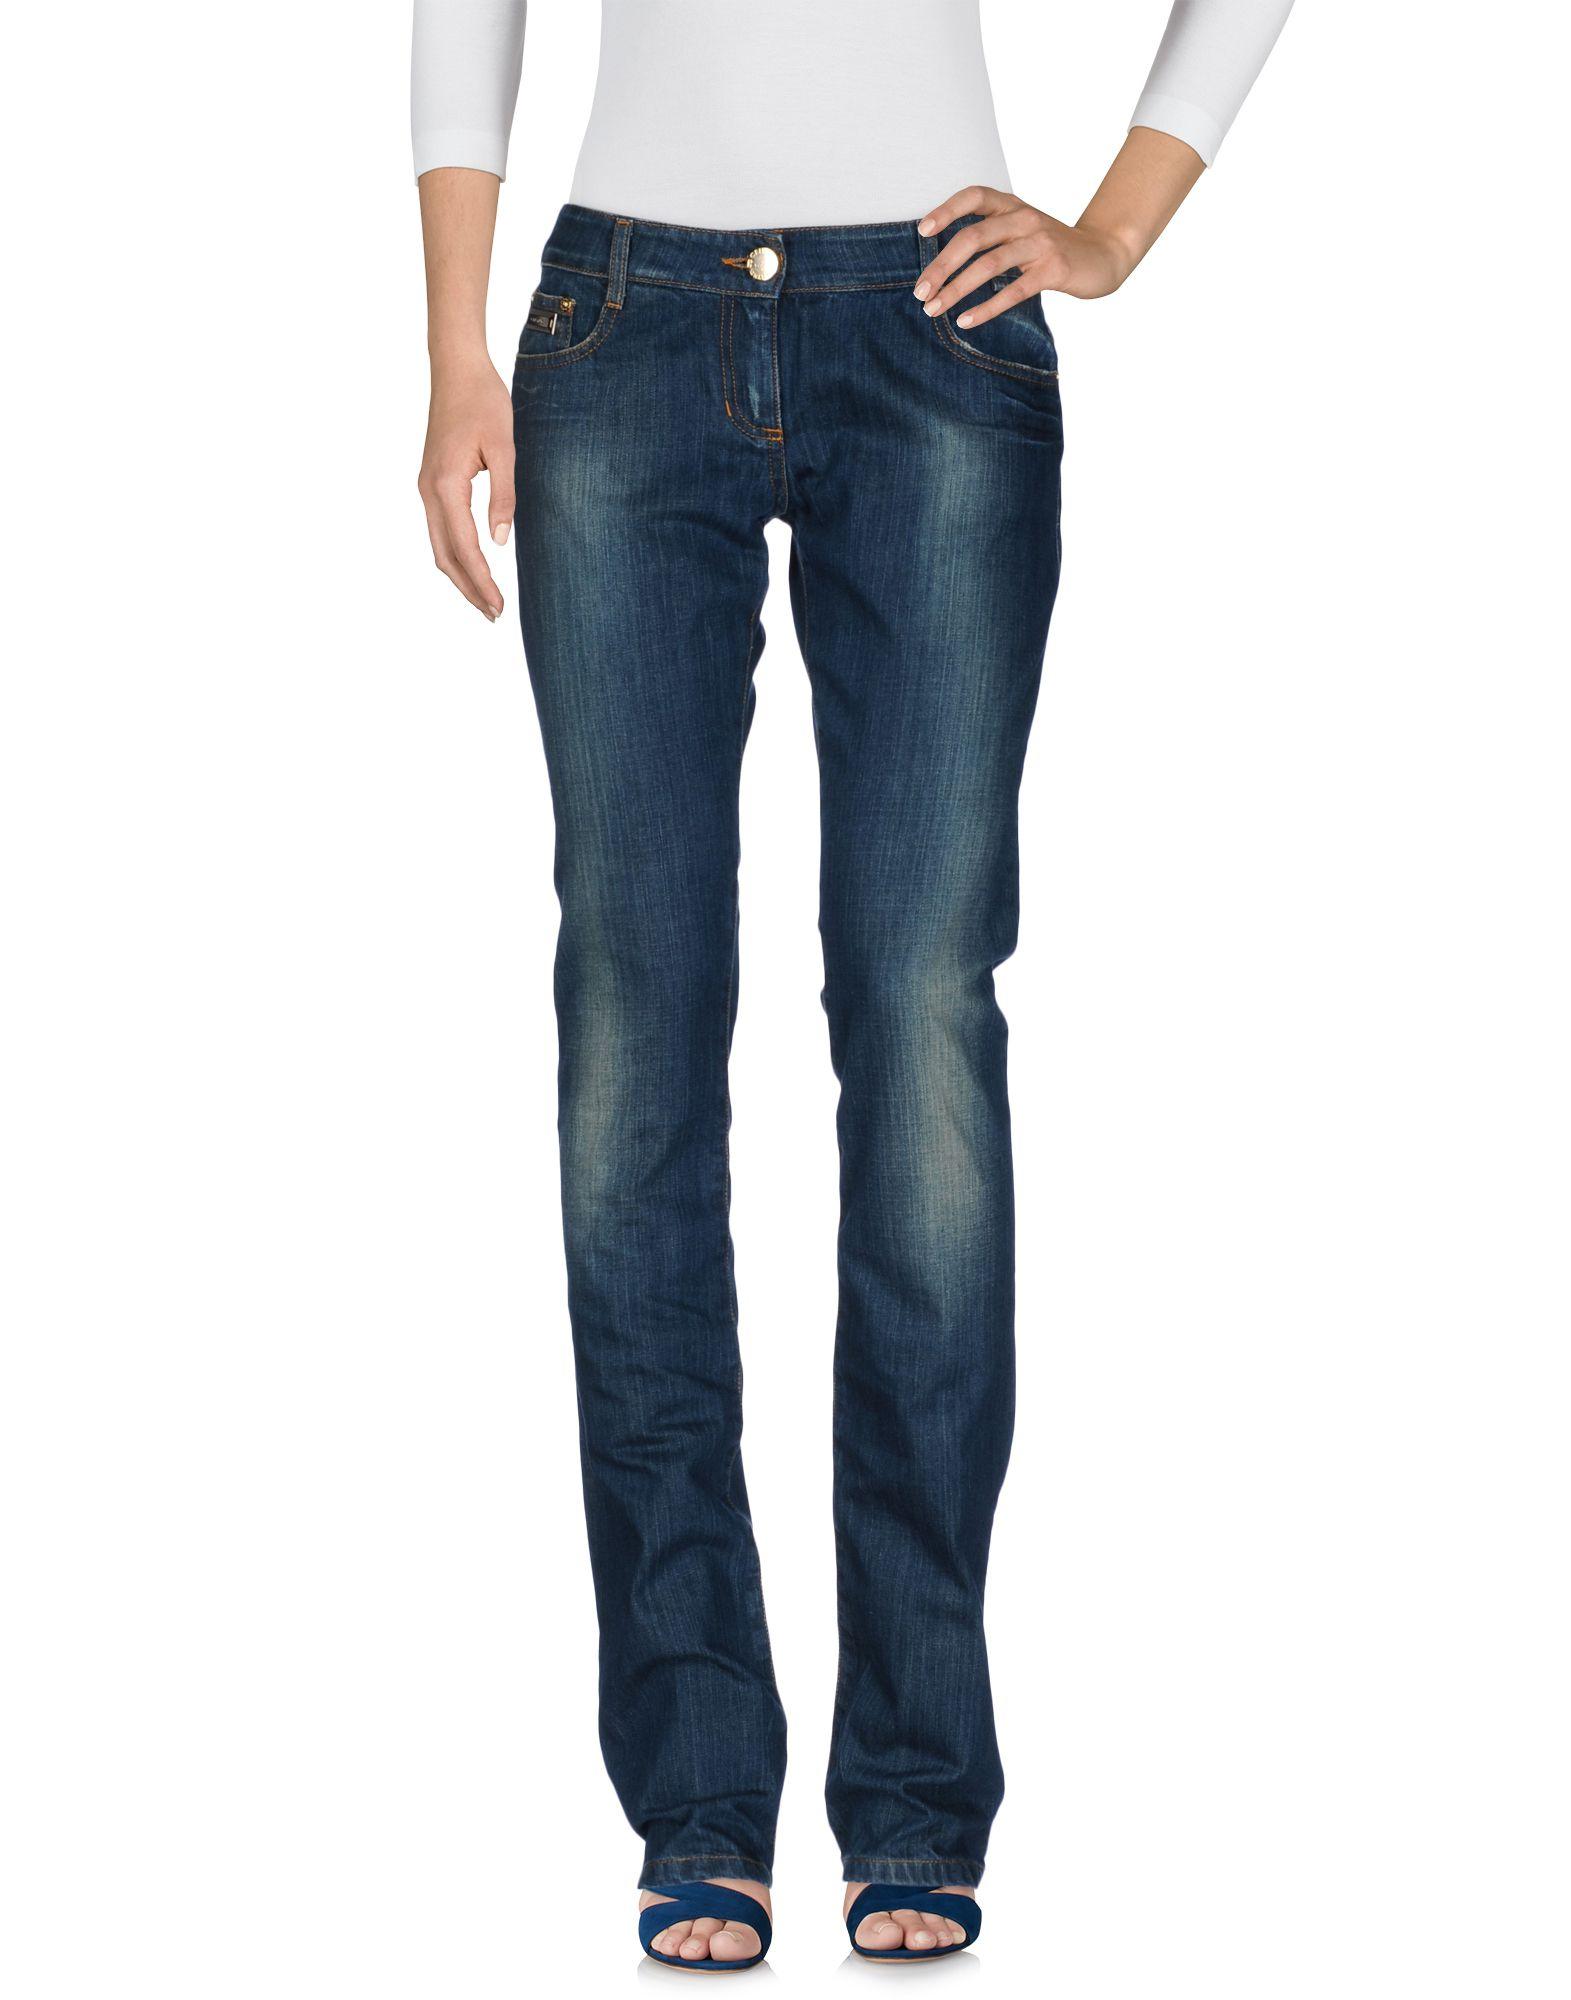 ELISABETTA FRANCHI JEANS for CELYN B. Джинсовые брюки elisabetta franchi рубашка от elisabetta franchi 55248